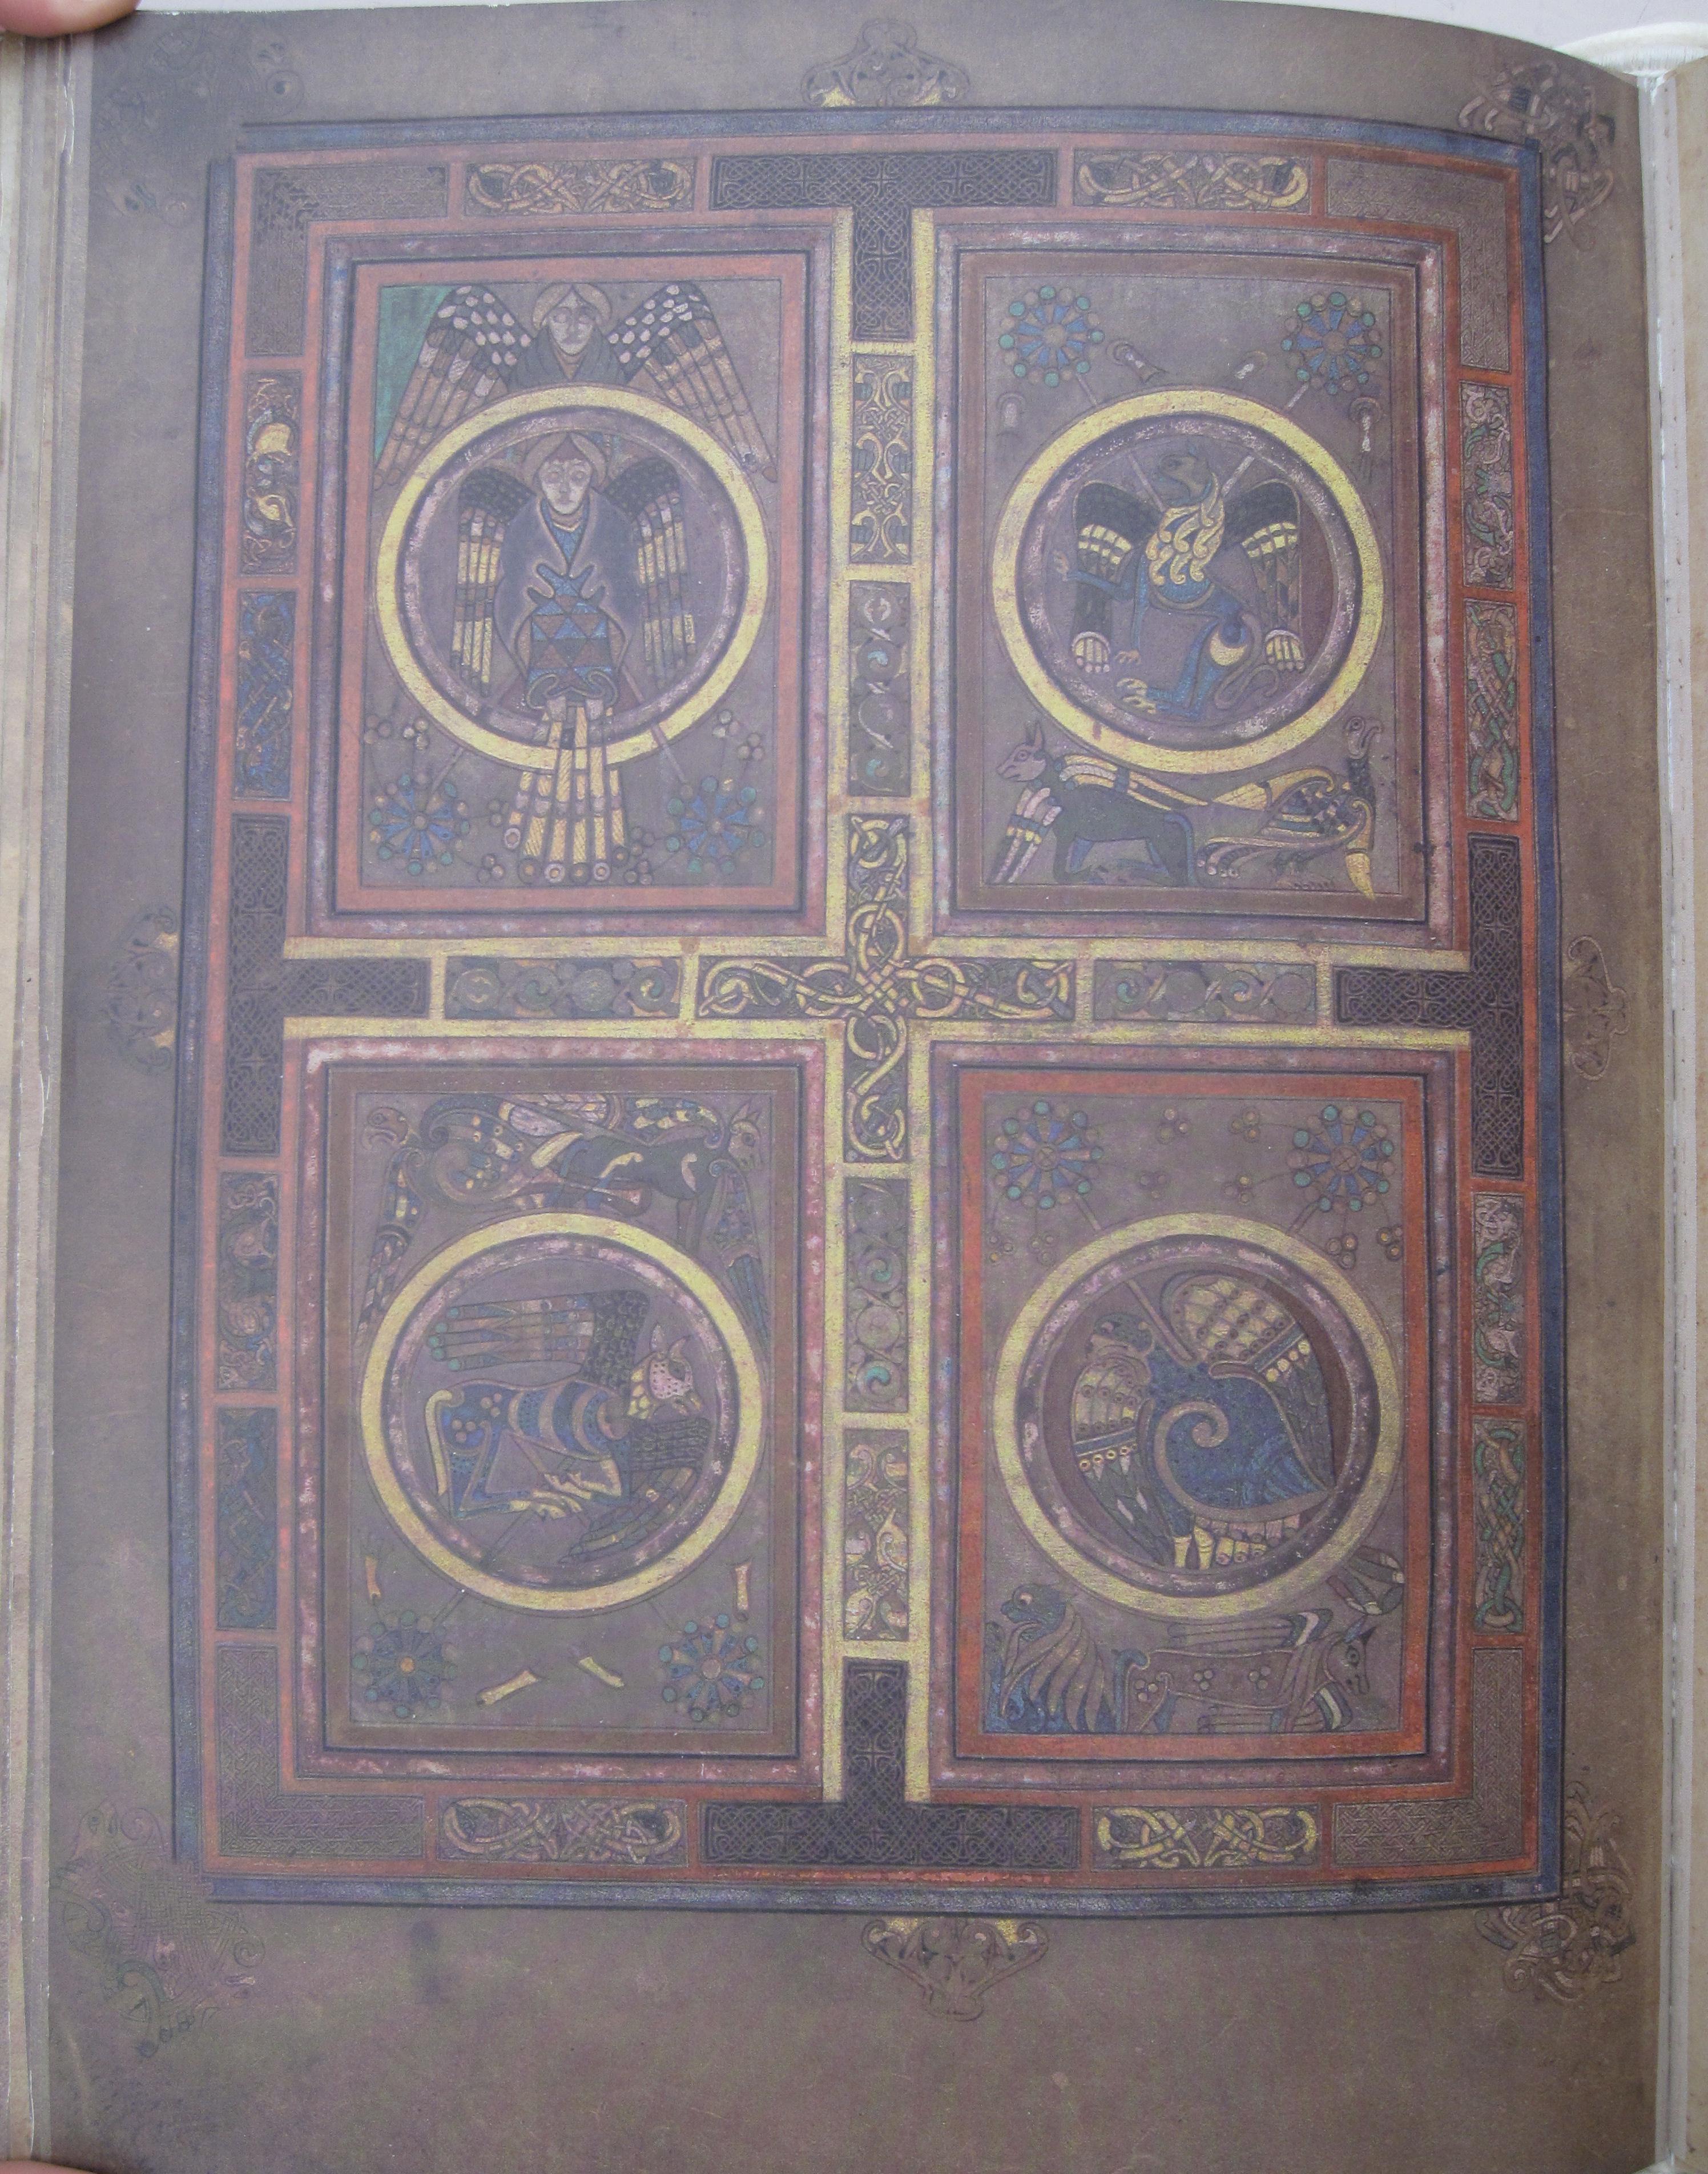 Fine Art Facsimiles The Book Of Kells And The Lindisfarne Gospels